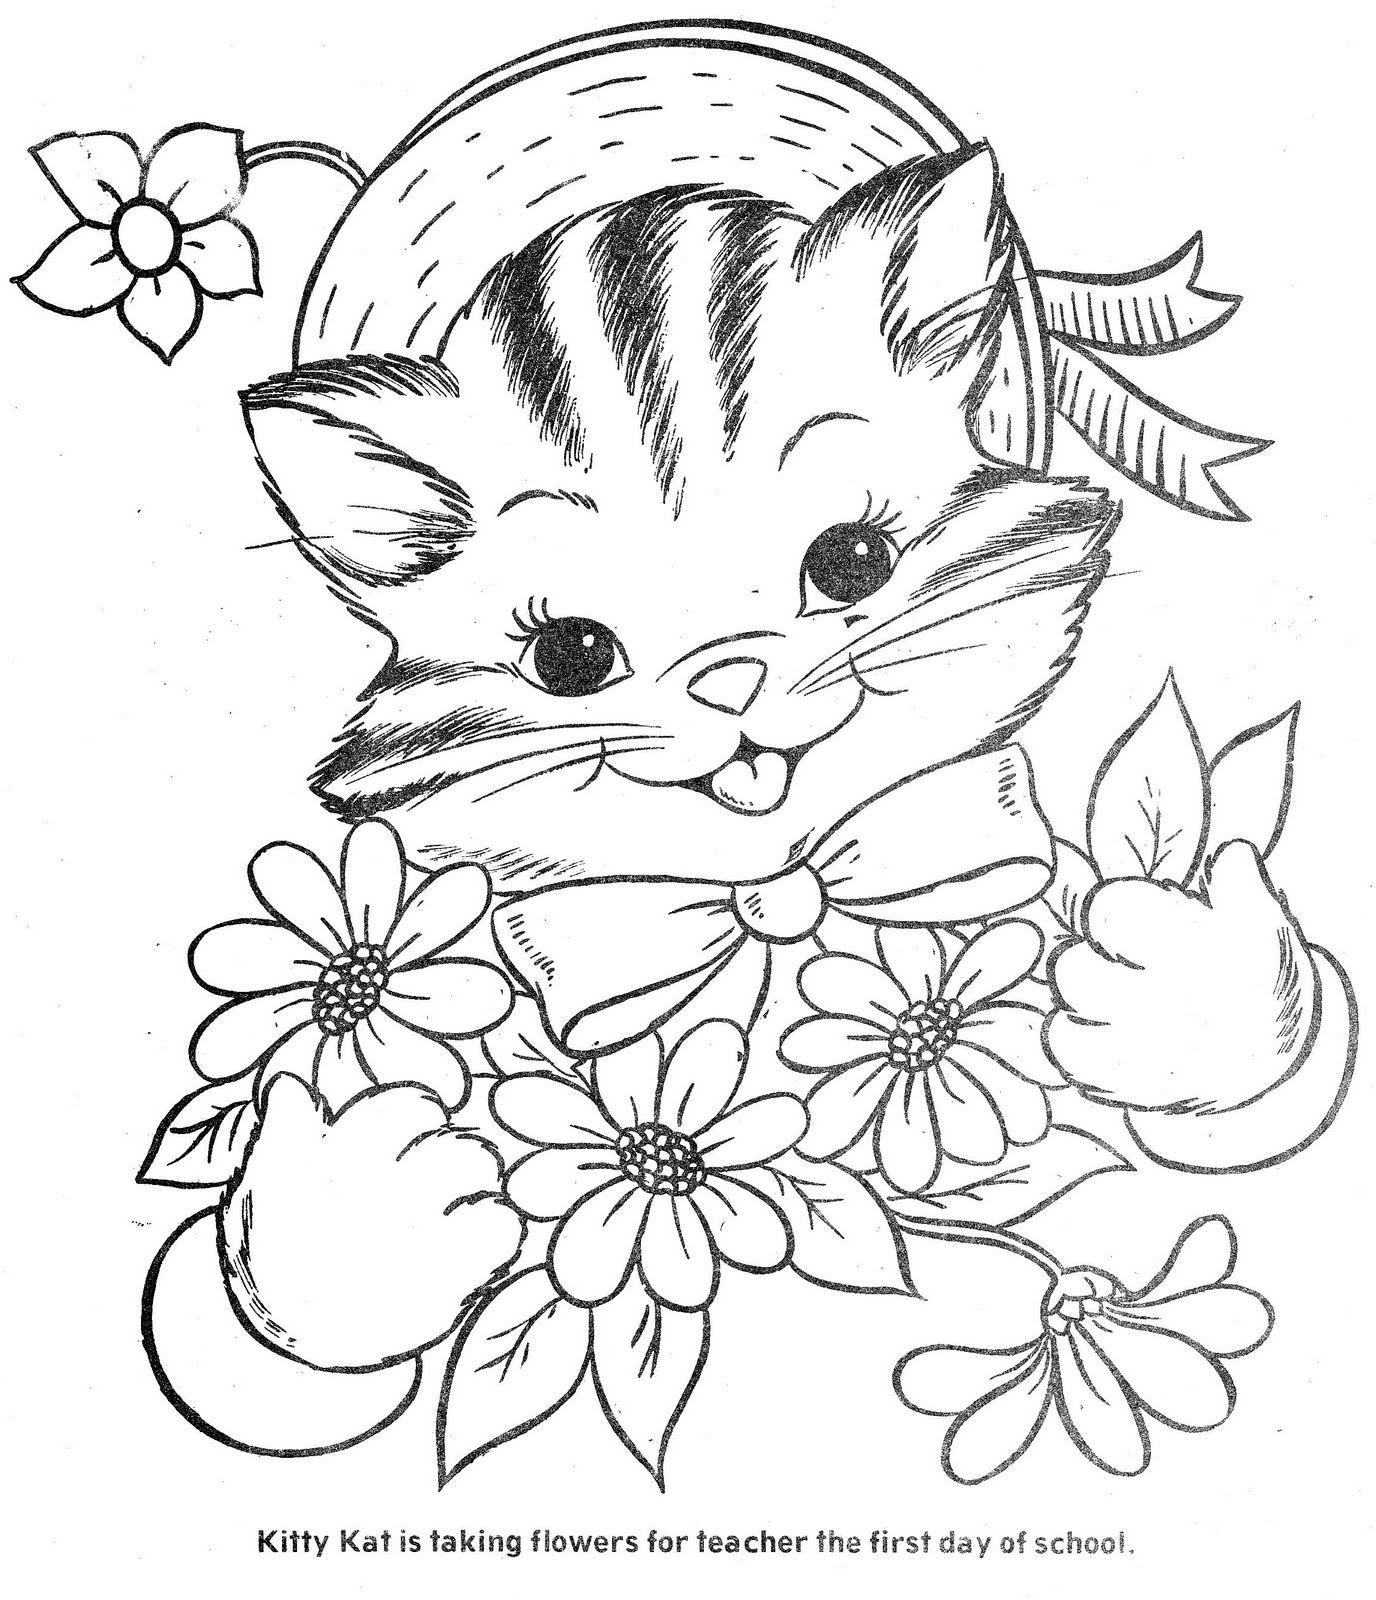 The Three Little Kittens | COLORING BOOKS VINTAGE 1 | Pinterest